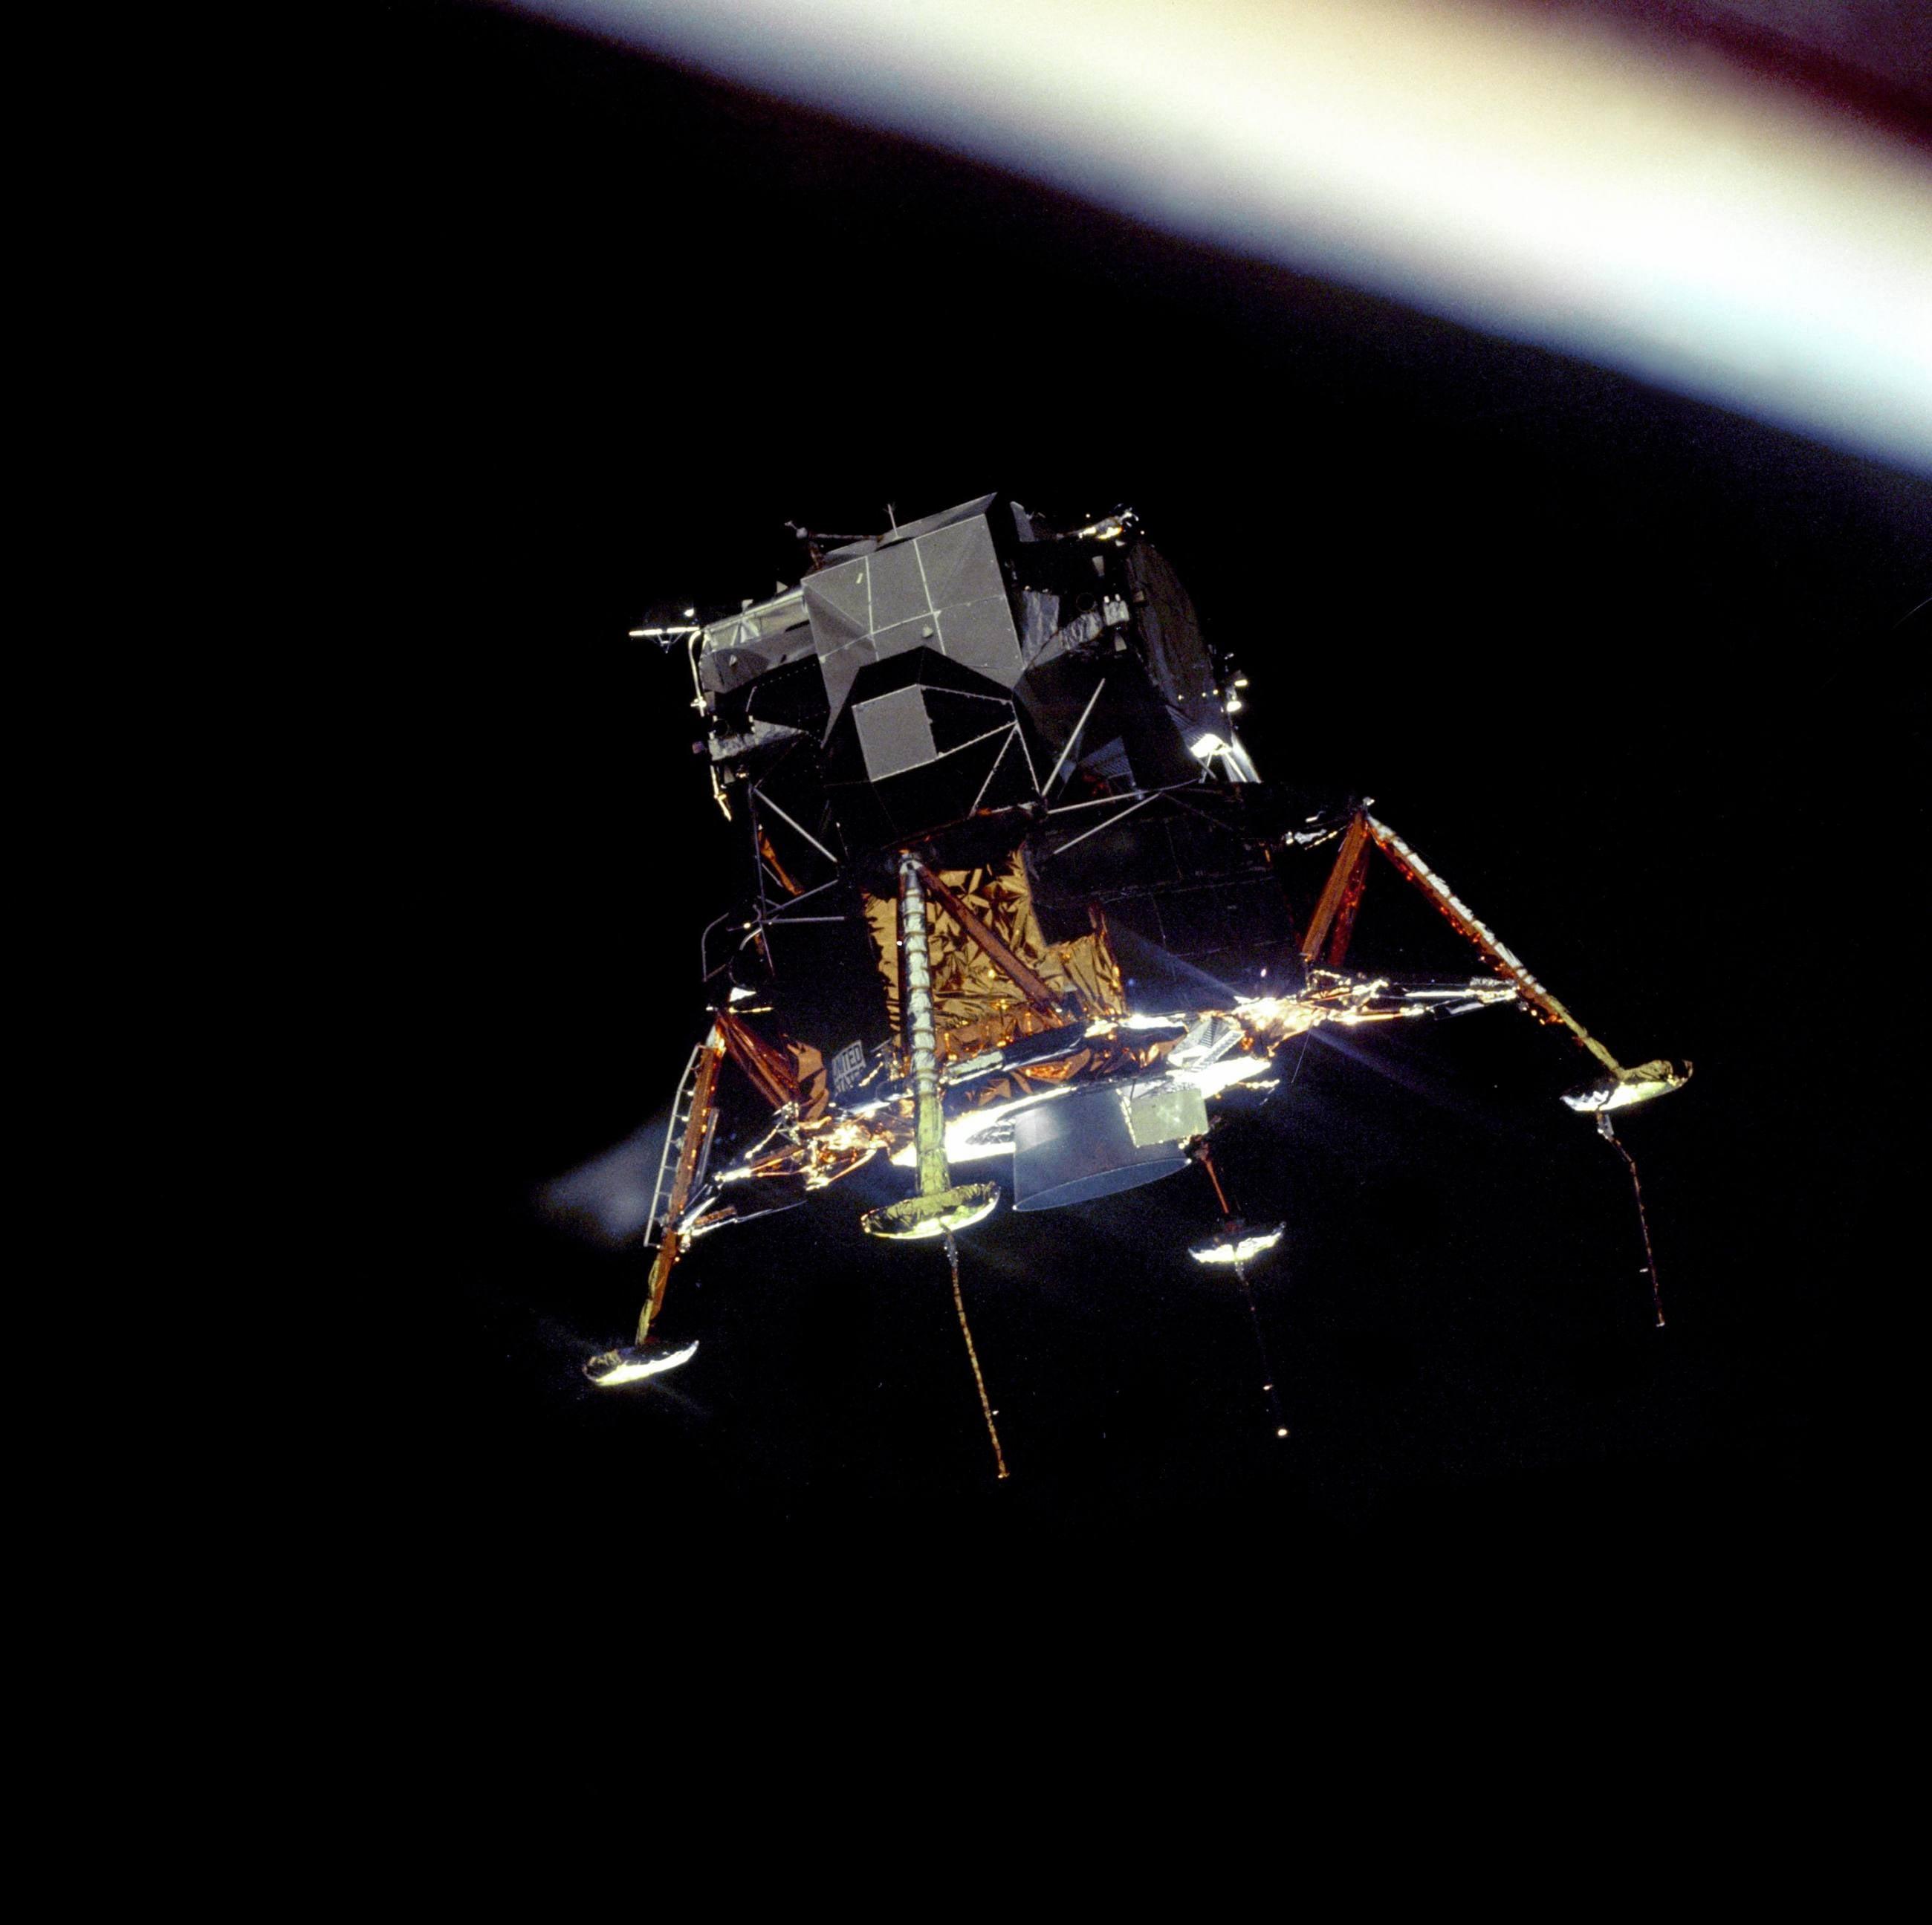 Apollo 11 Lunar Module Eagle in orbit